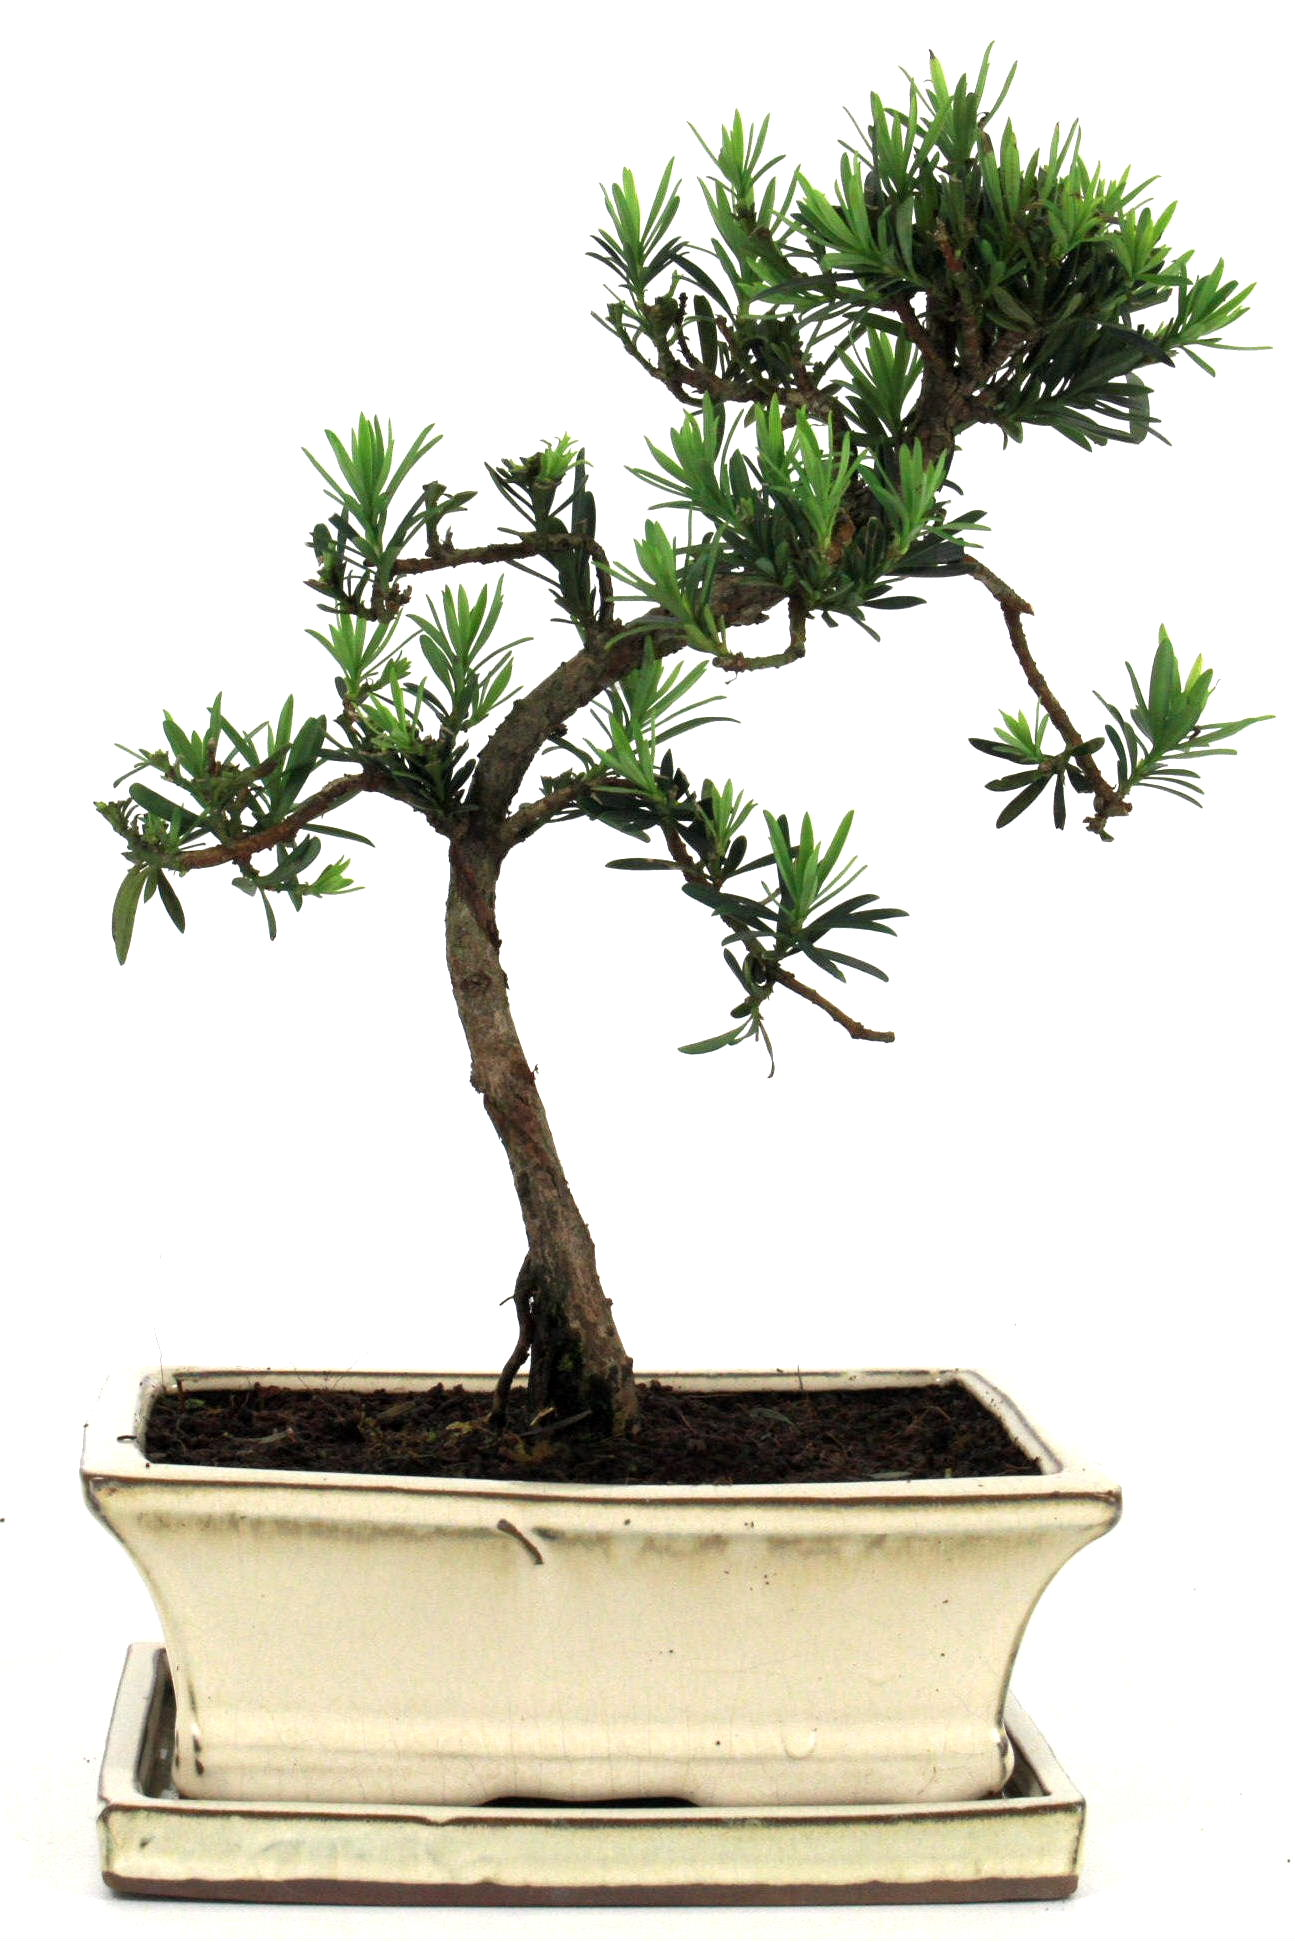 steineibe bonsai 35 40 cm 1942 bei oyaki bonsai kaufen. Black Bedroom Furniture Sets. Home Design Ideas